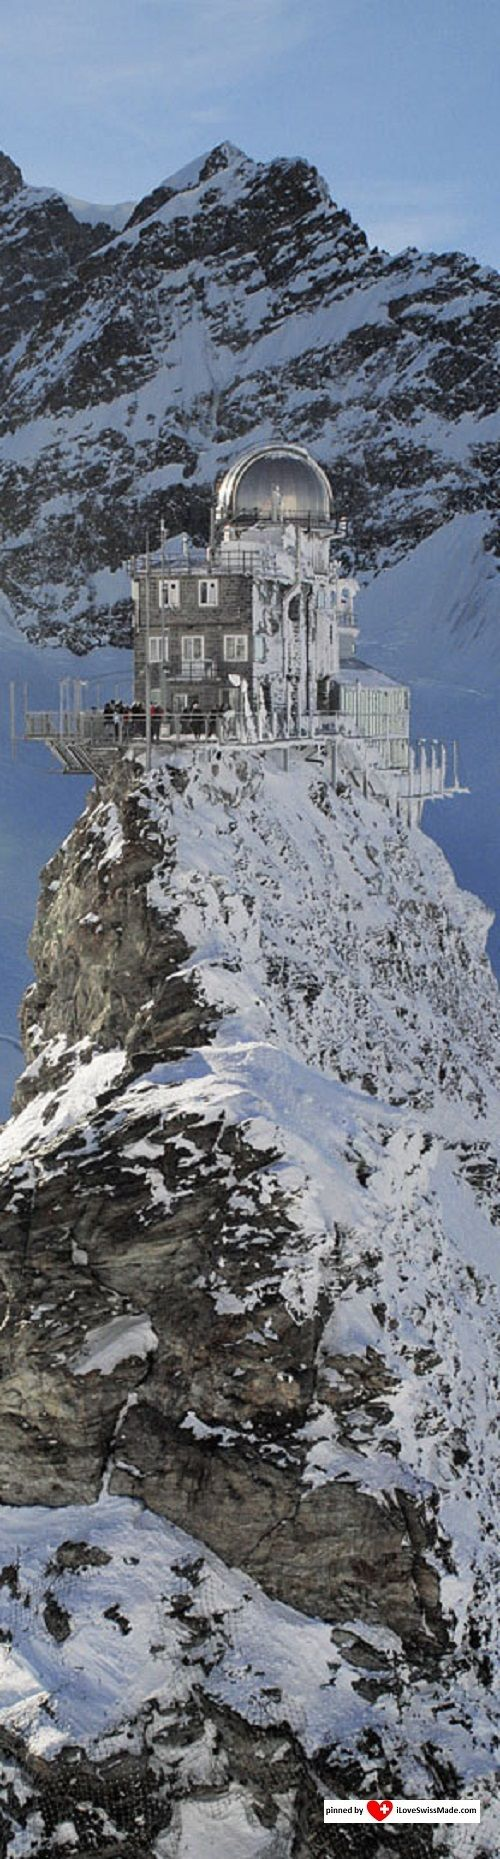 Jungfraujoch Top of Europe. SWITZERLAND  Photo Jungfrau.ch, adapted to Pinterest by iLoveSwissMade